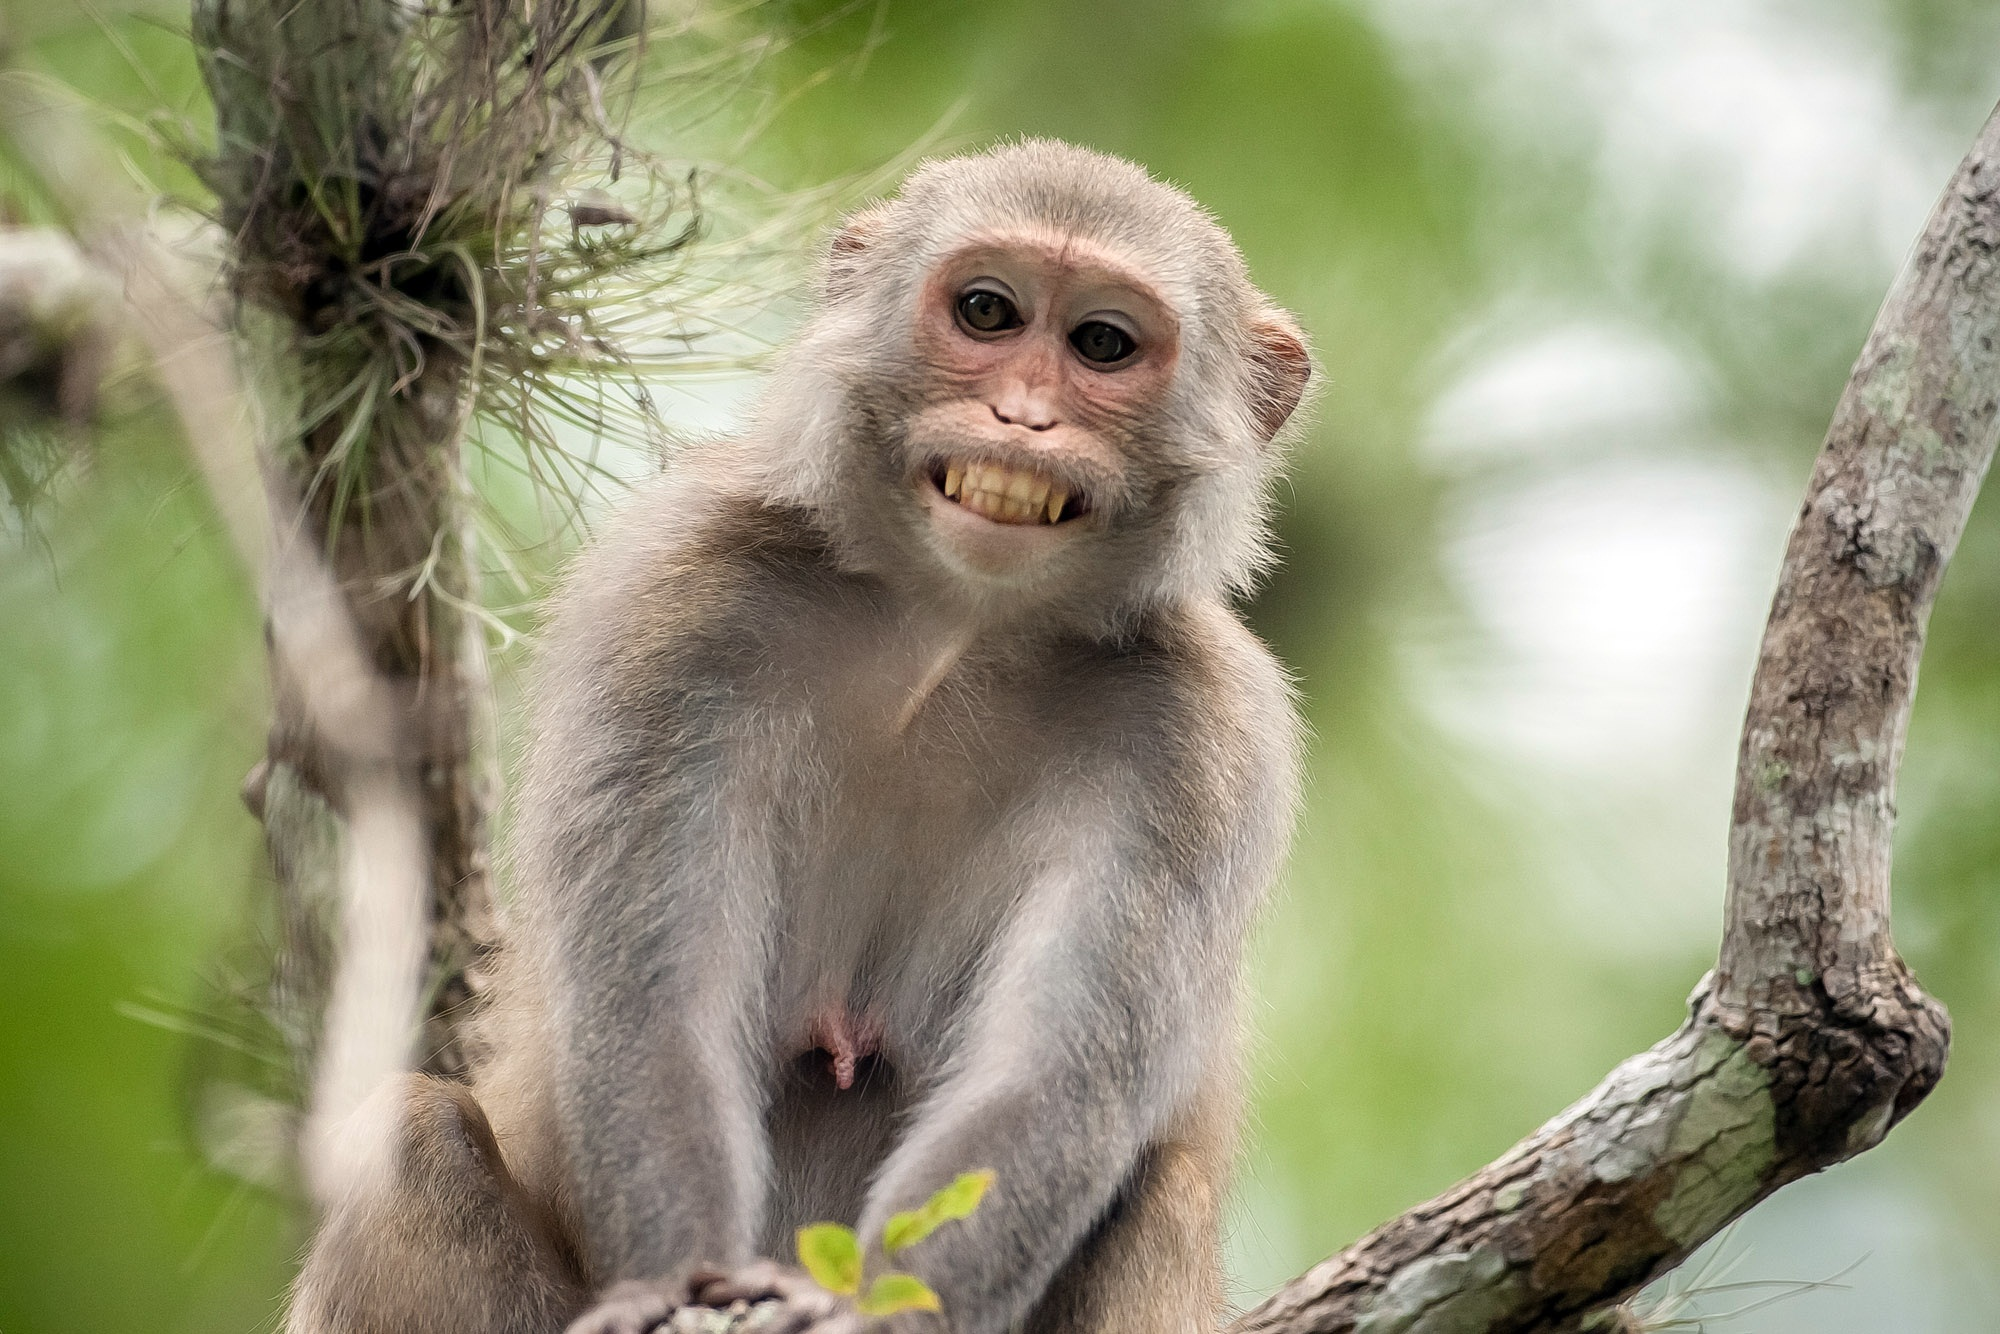 images of monkeys smile